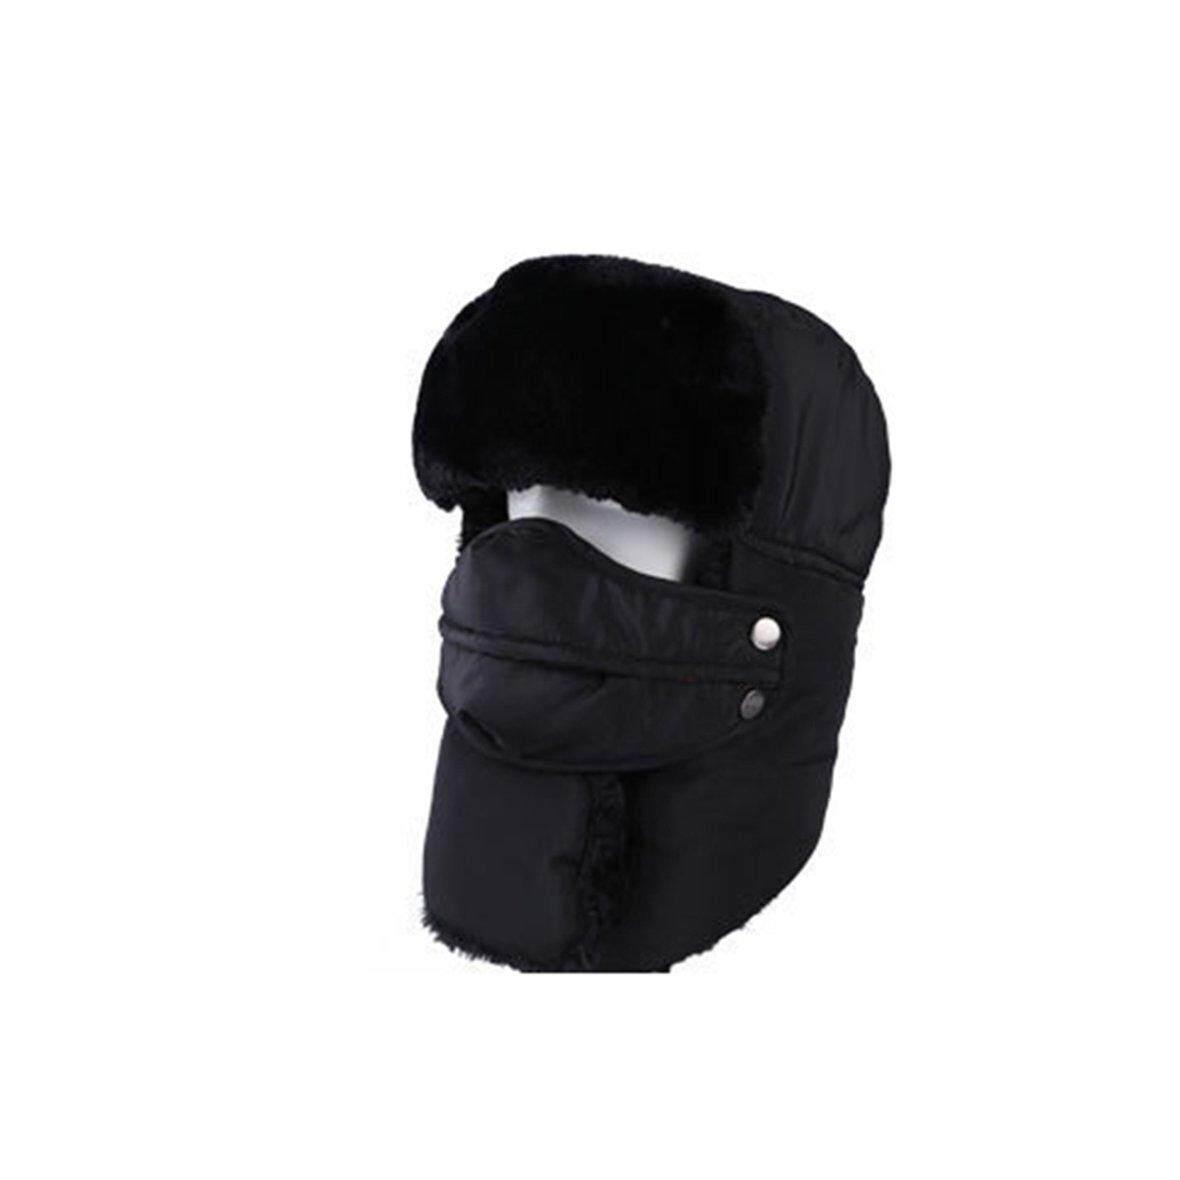 Hot Sellers Winter Lei Feng hat thickening plus velvet warm ear protection ski cap